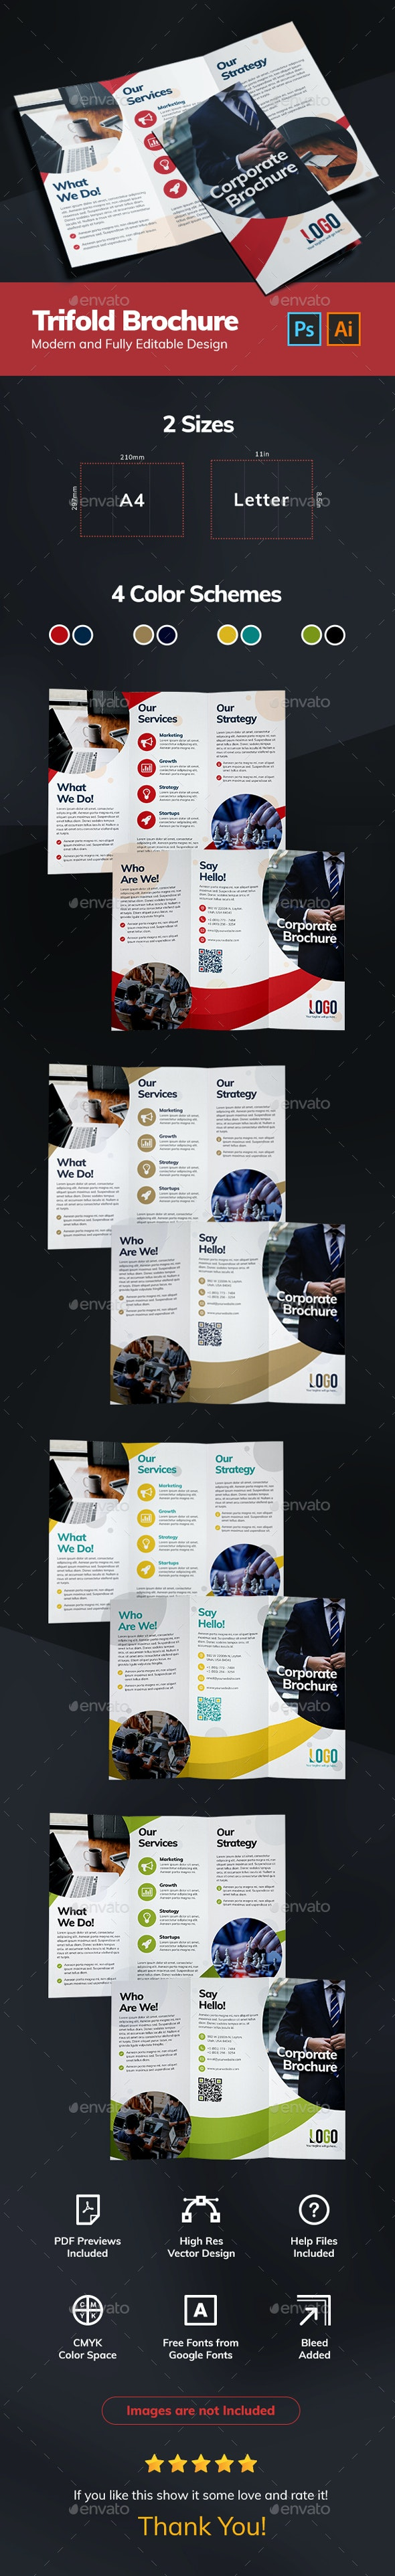 Creative Trifold Brochure - Brochures Print Templates